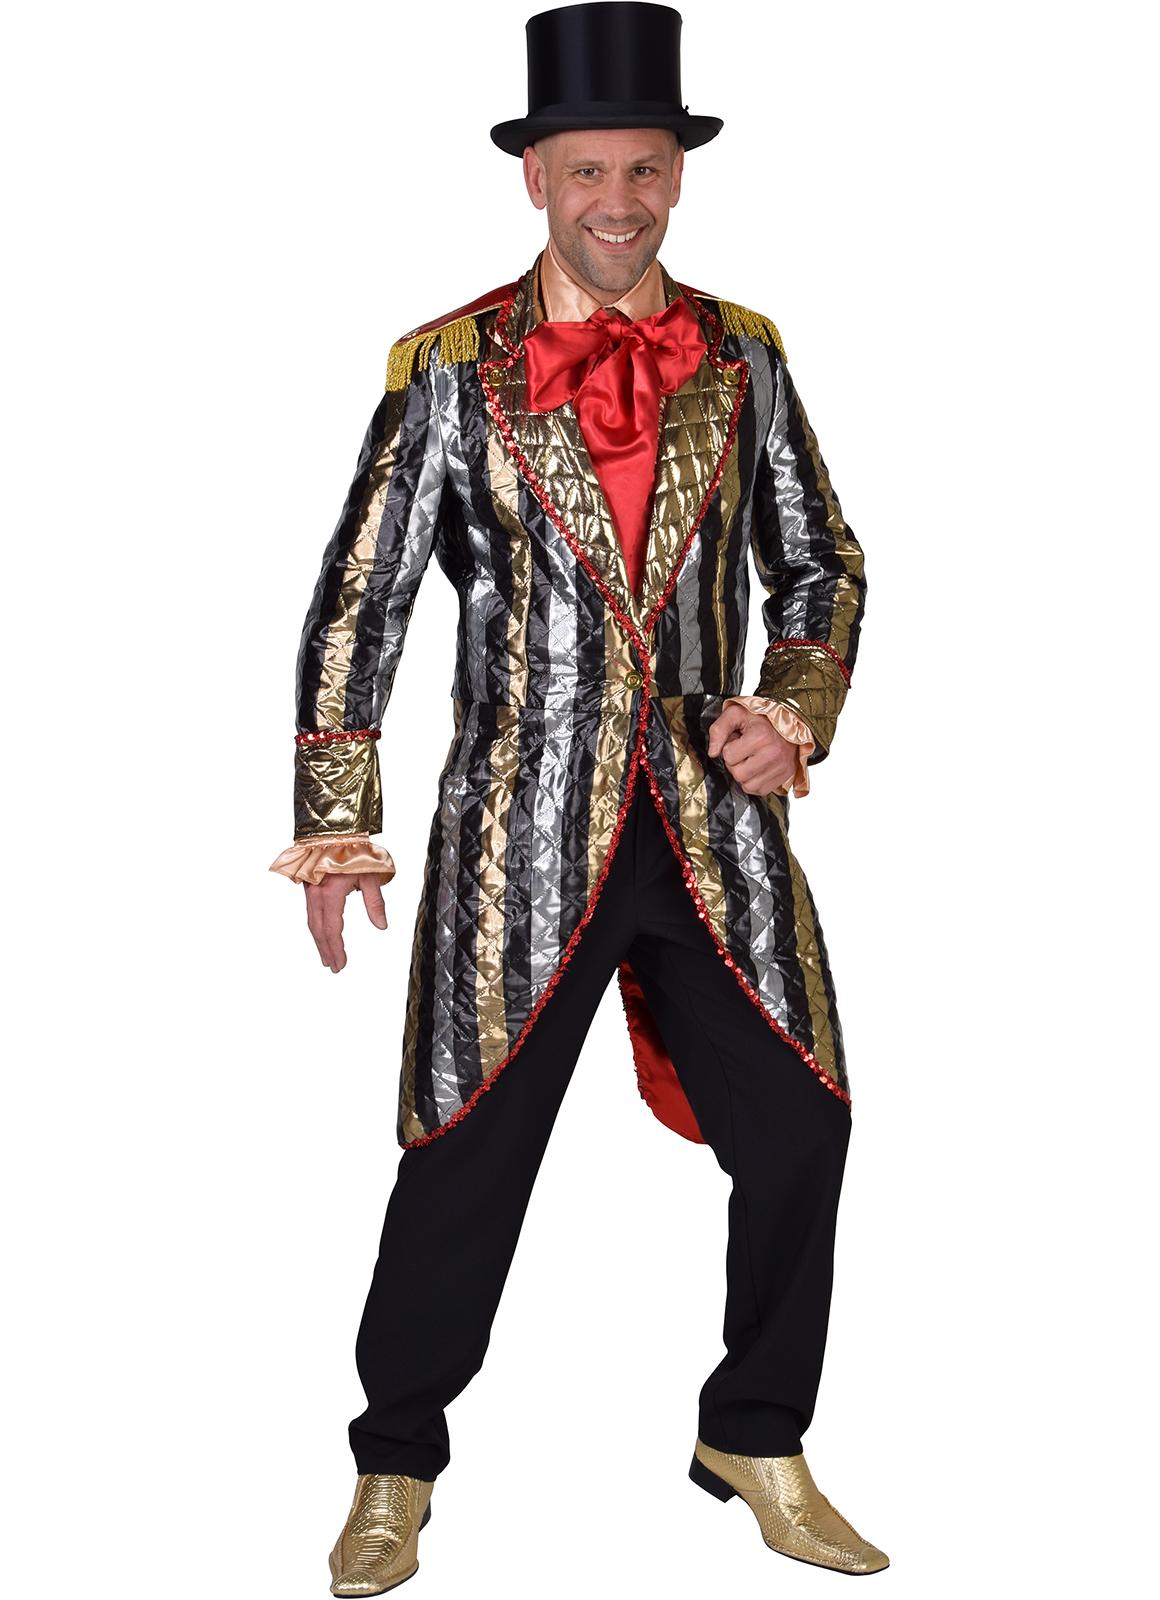 Gents Tailcoat - Mutli striped jacket